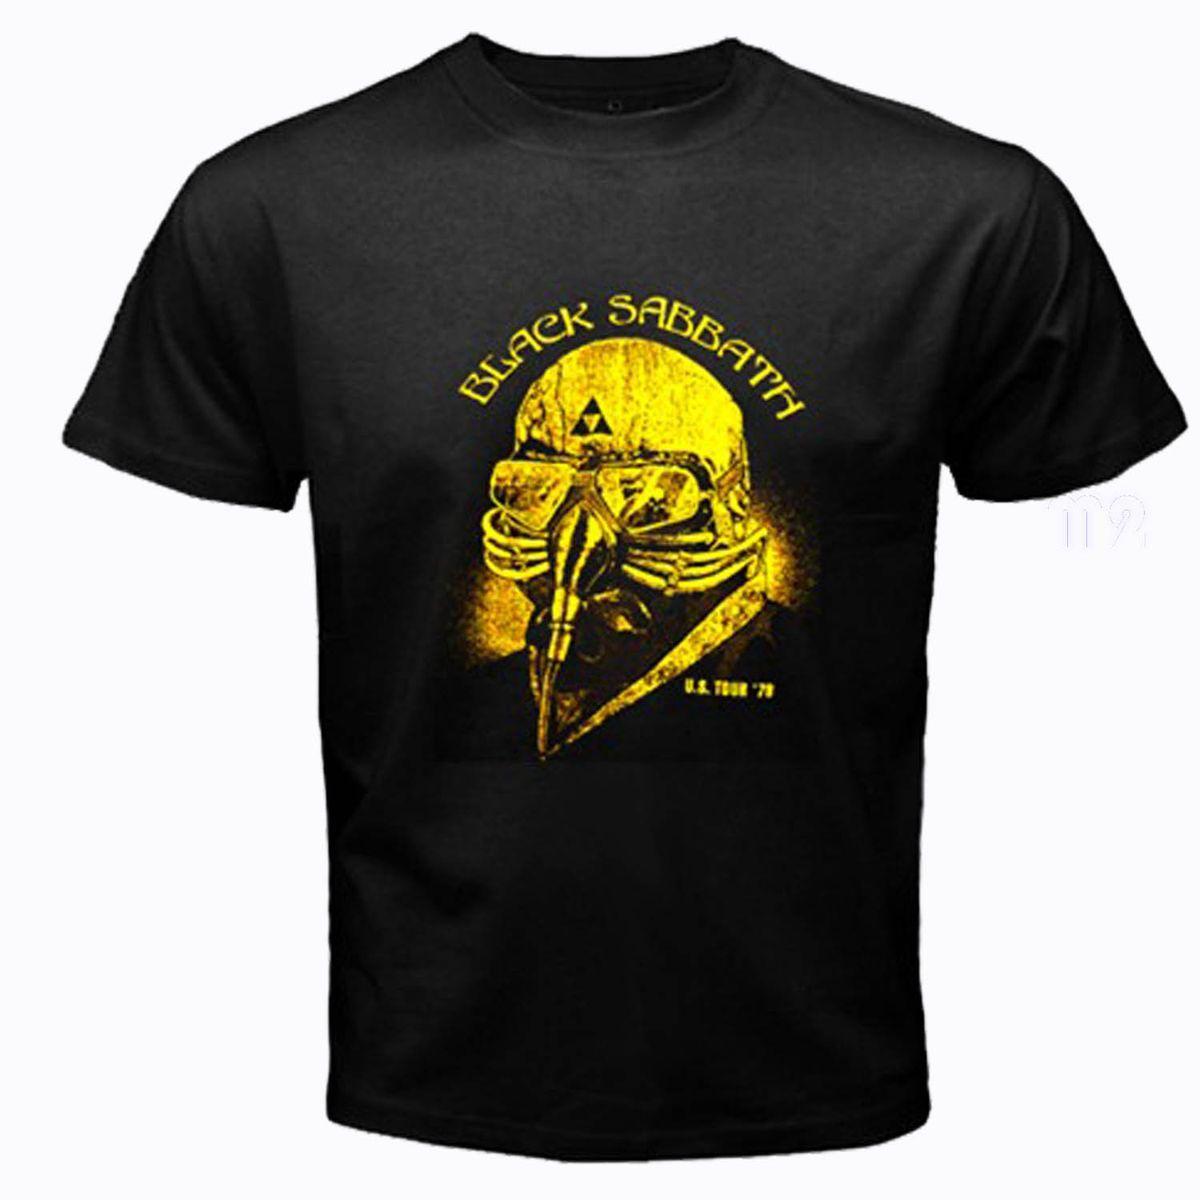 Sabbath tour t shist tony stark iron man avengers robert downey S 3XL